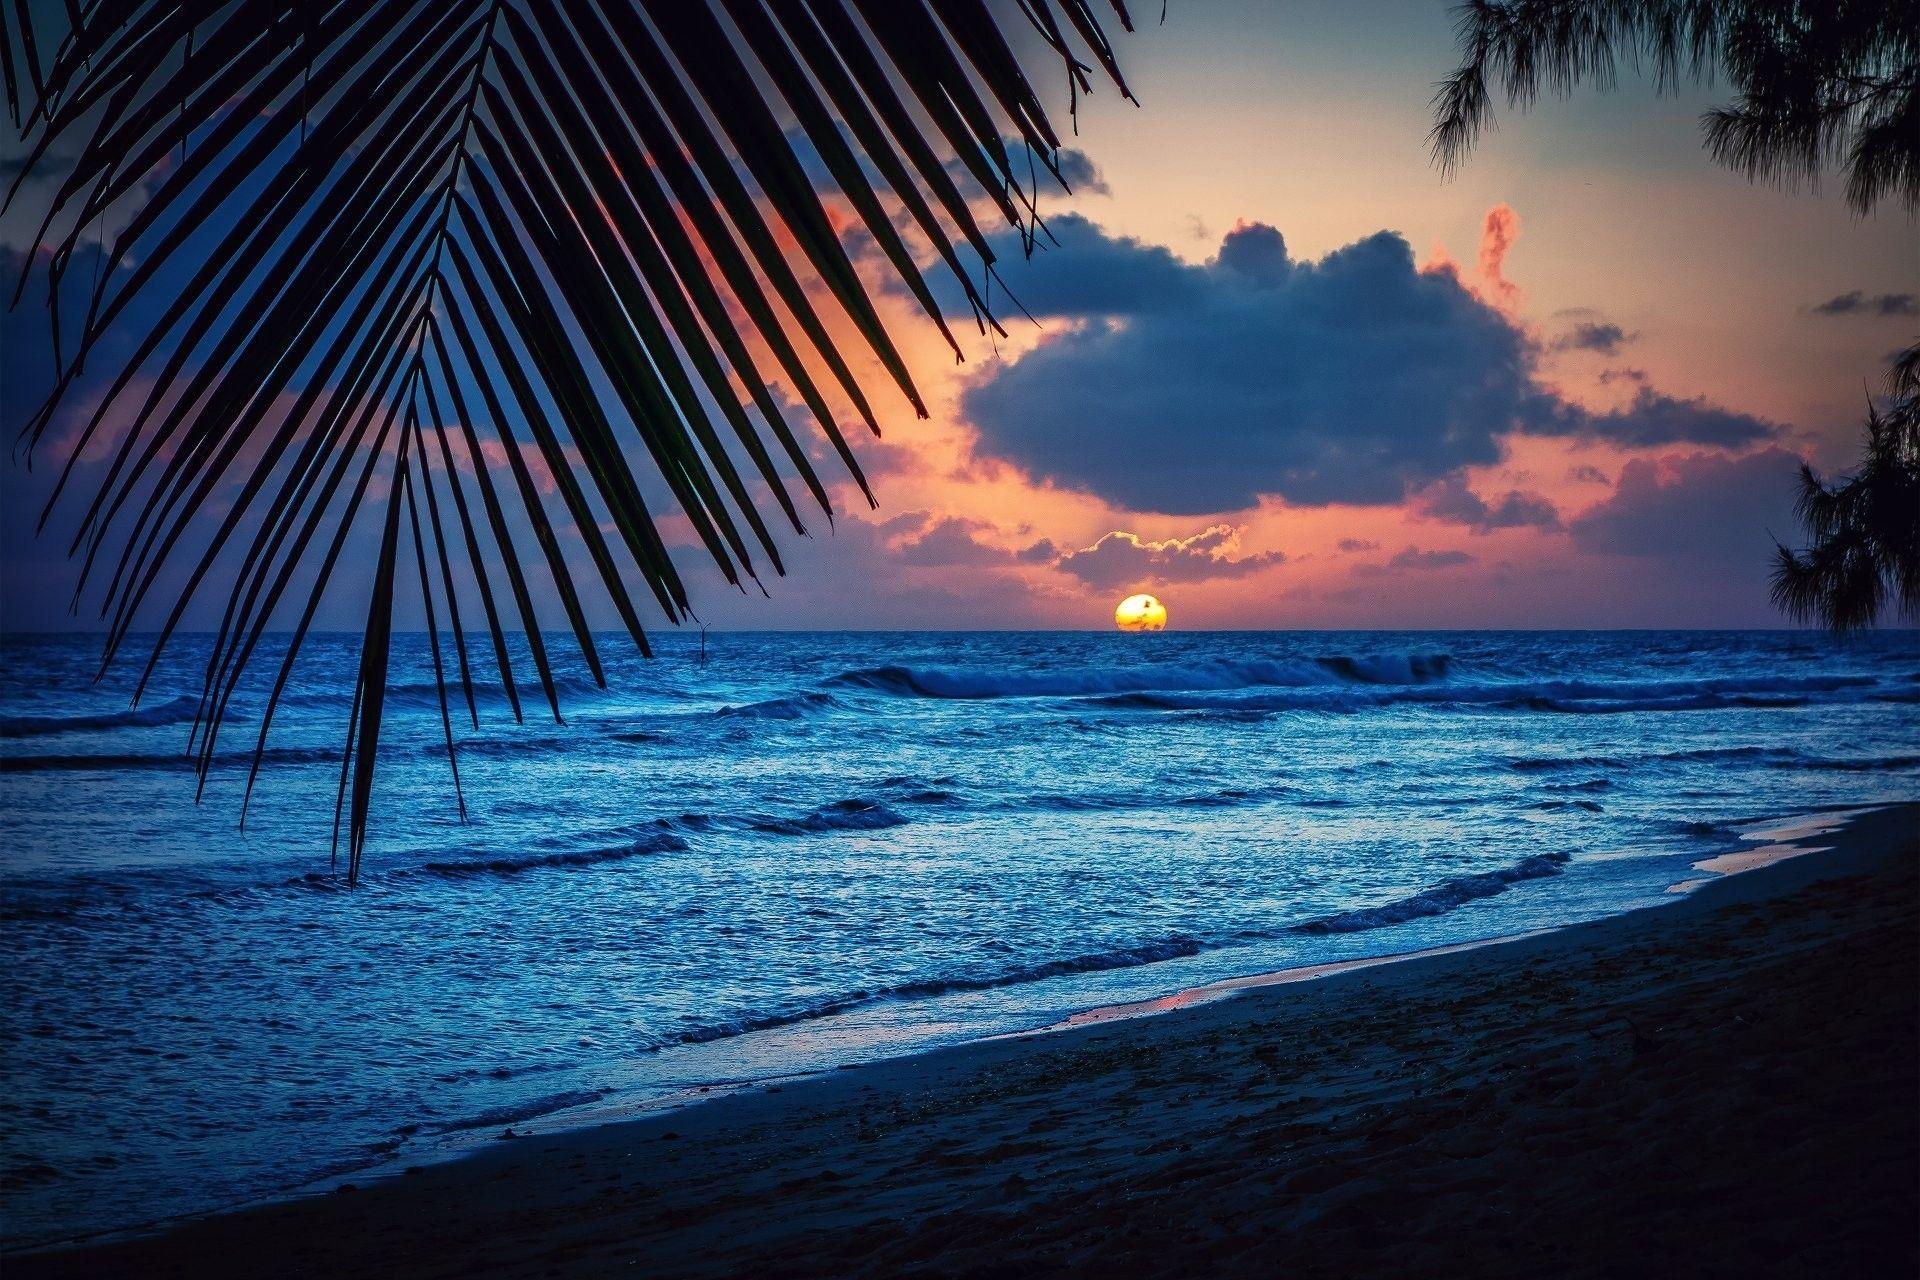 Maldives Night Wallpapers 1080p As Wallpaper Hd Beach